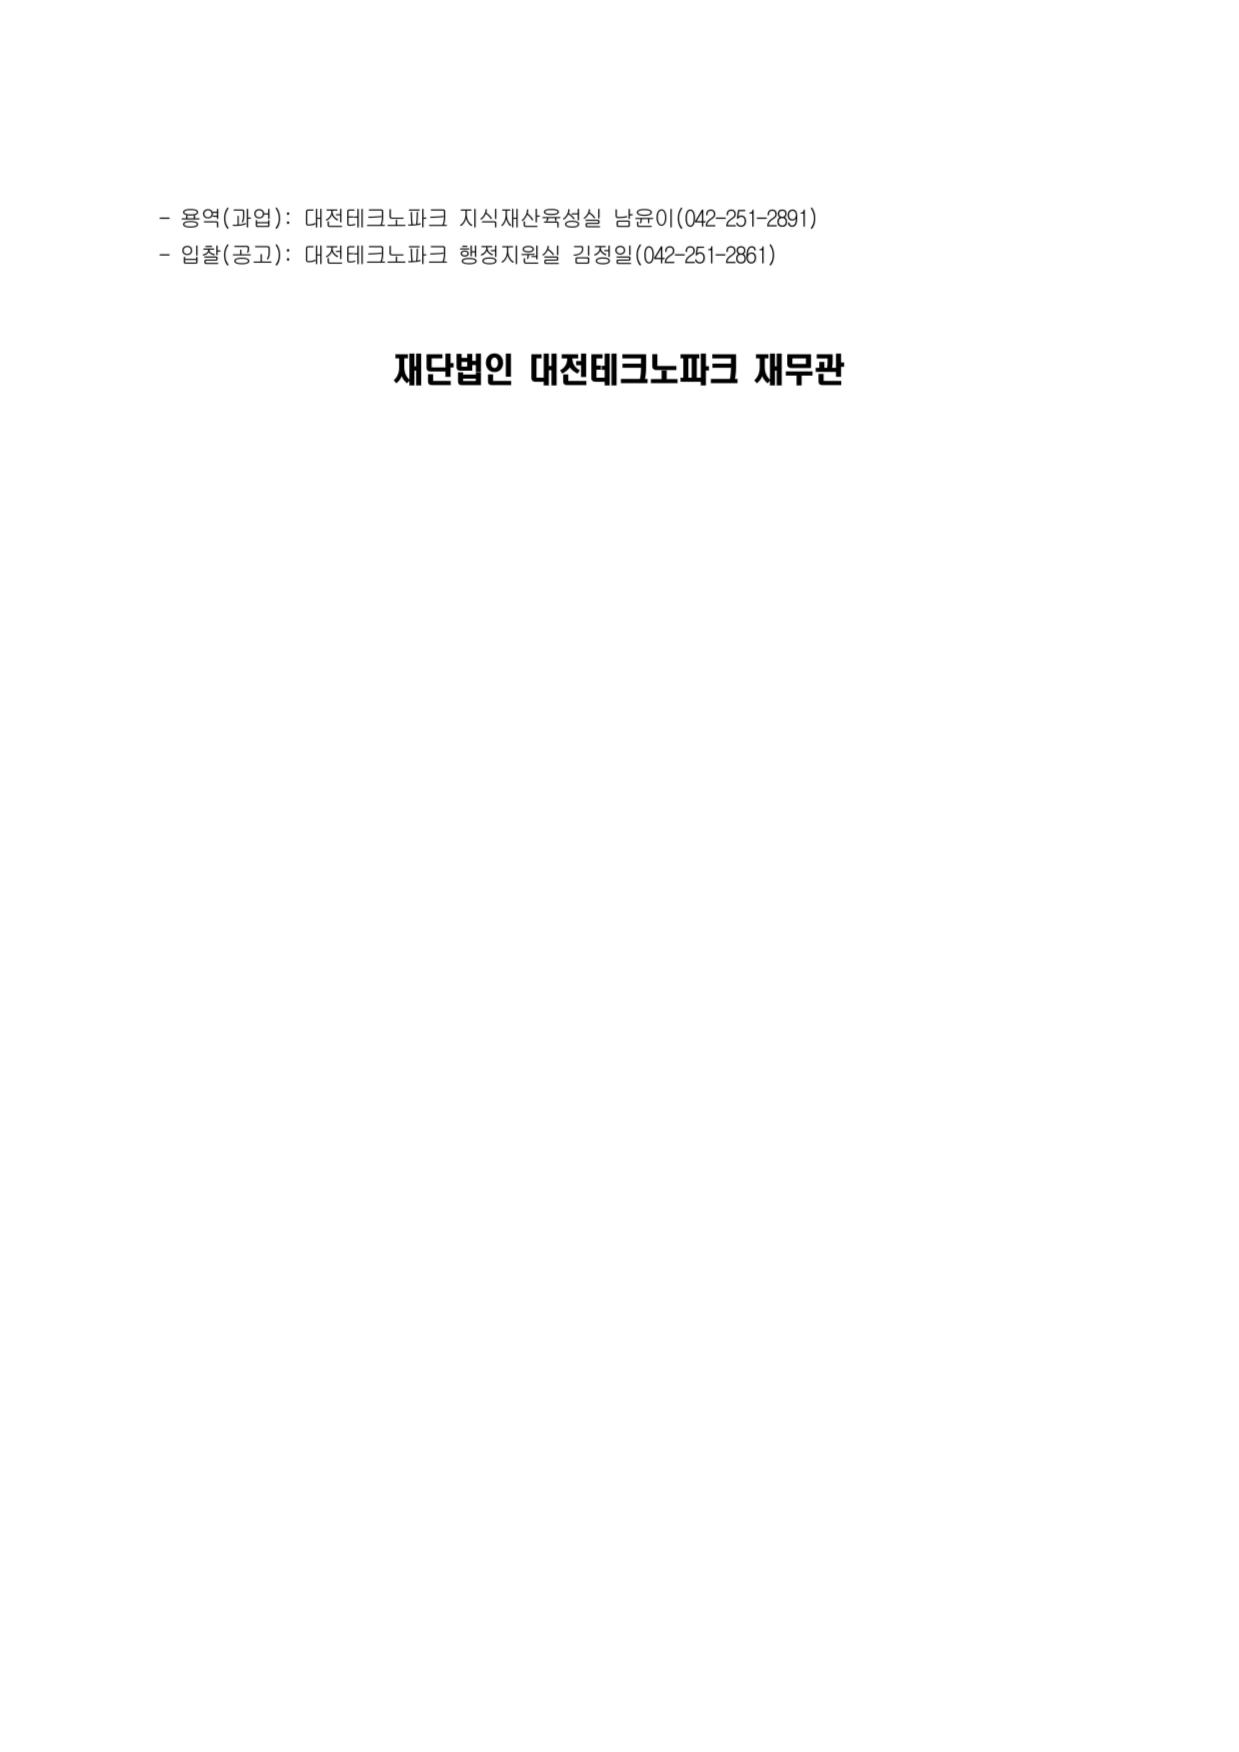 b541352b-e2e1-47f9-8170-11dafe2d2bcf.pdf-0007.jpg